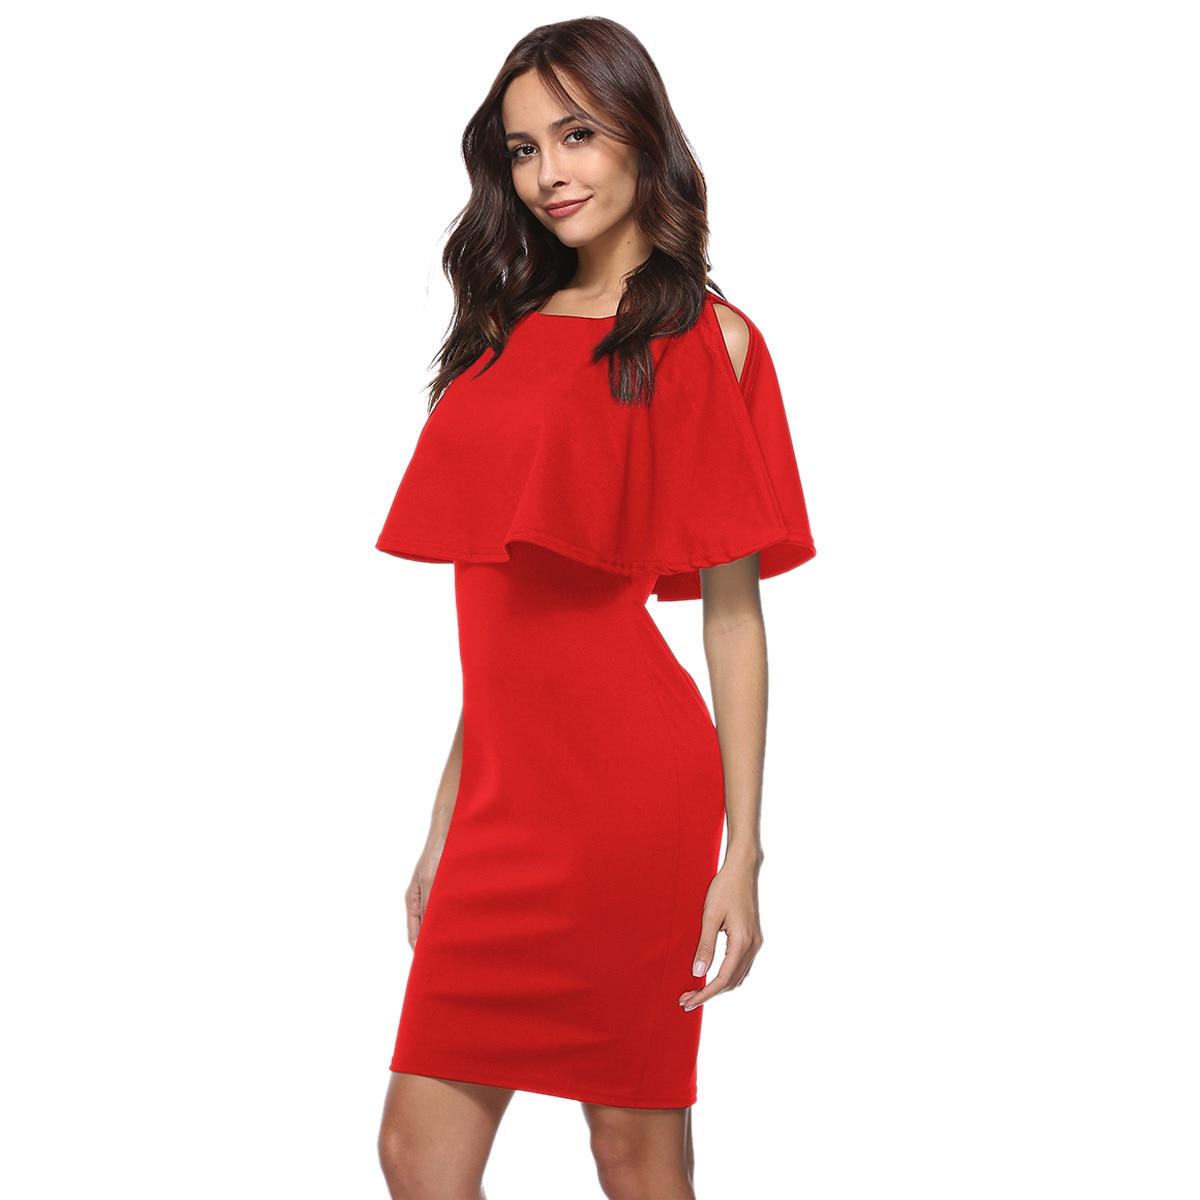 Ruffle Dress 2019 Summer New Women 39 s Dress Elegant Wrap Dress Lotus Leaf Befree Exposed Backpack Hip Casual vestidos de verano in Dresses from Women 39 s Clothing